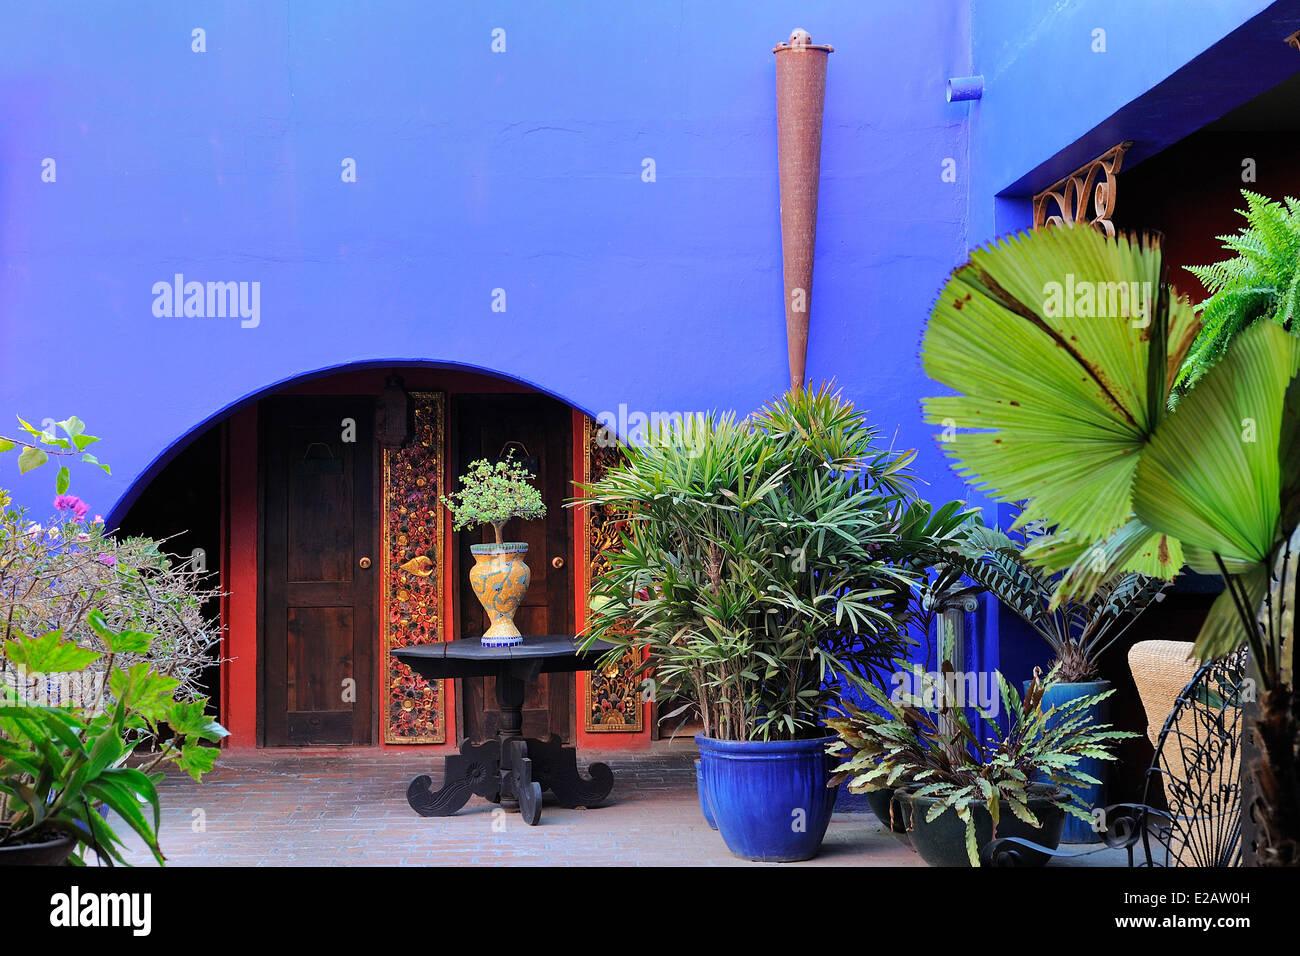 Mexico, Baja California Sur State, Todos Santos, Hotel California - Stock Image